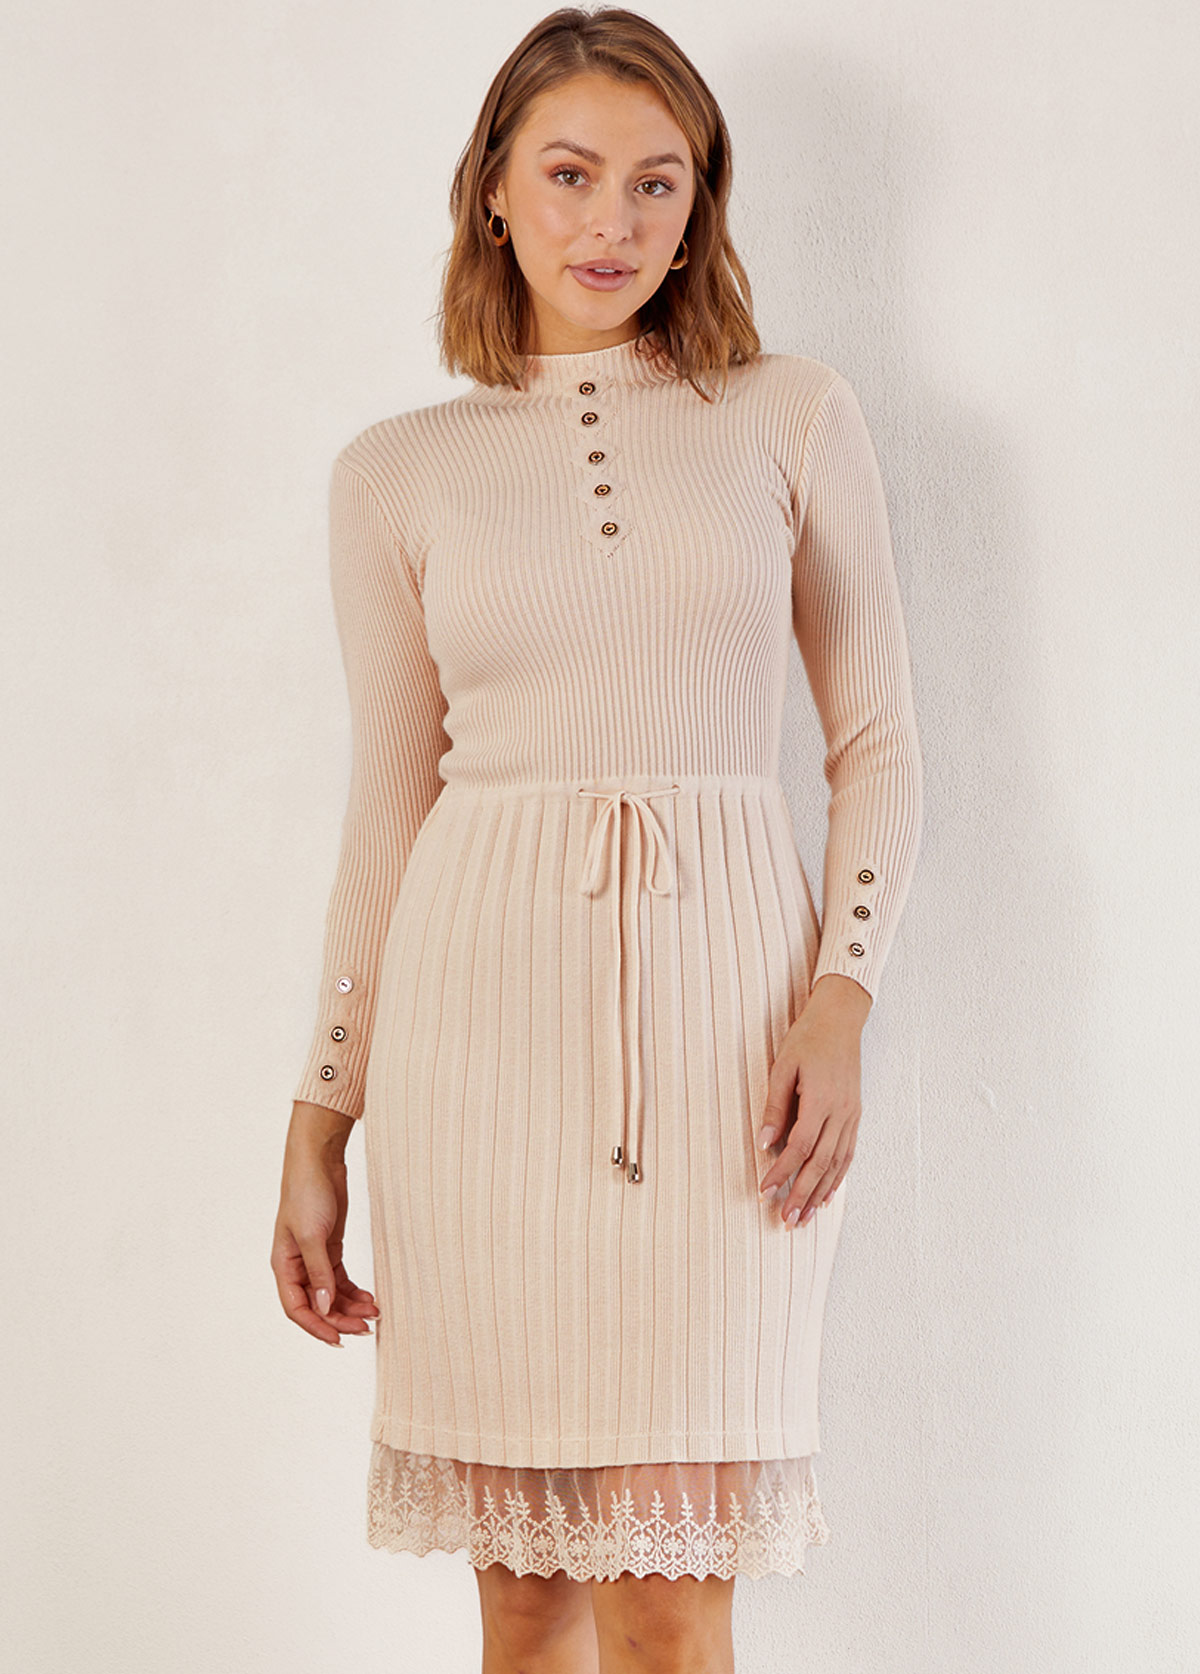 Solid Lace Patchwork Mock Neck Dress